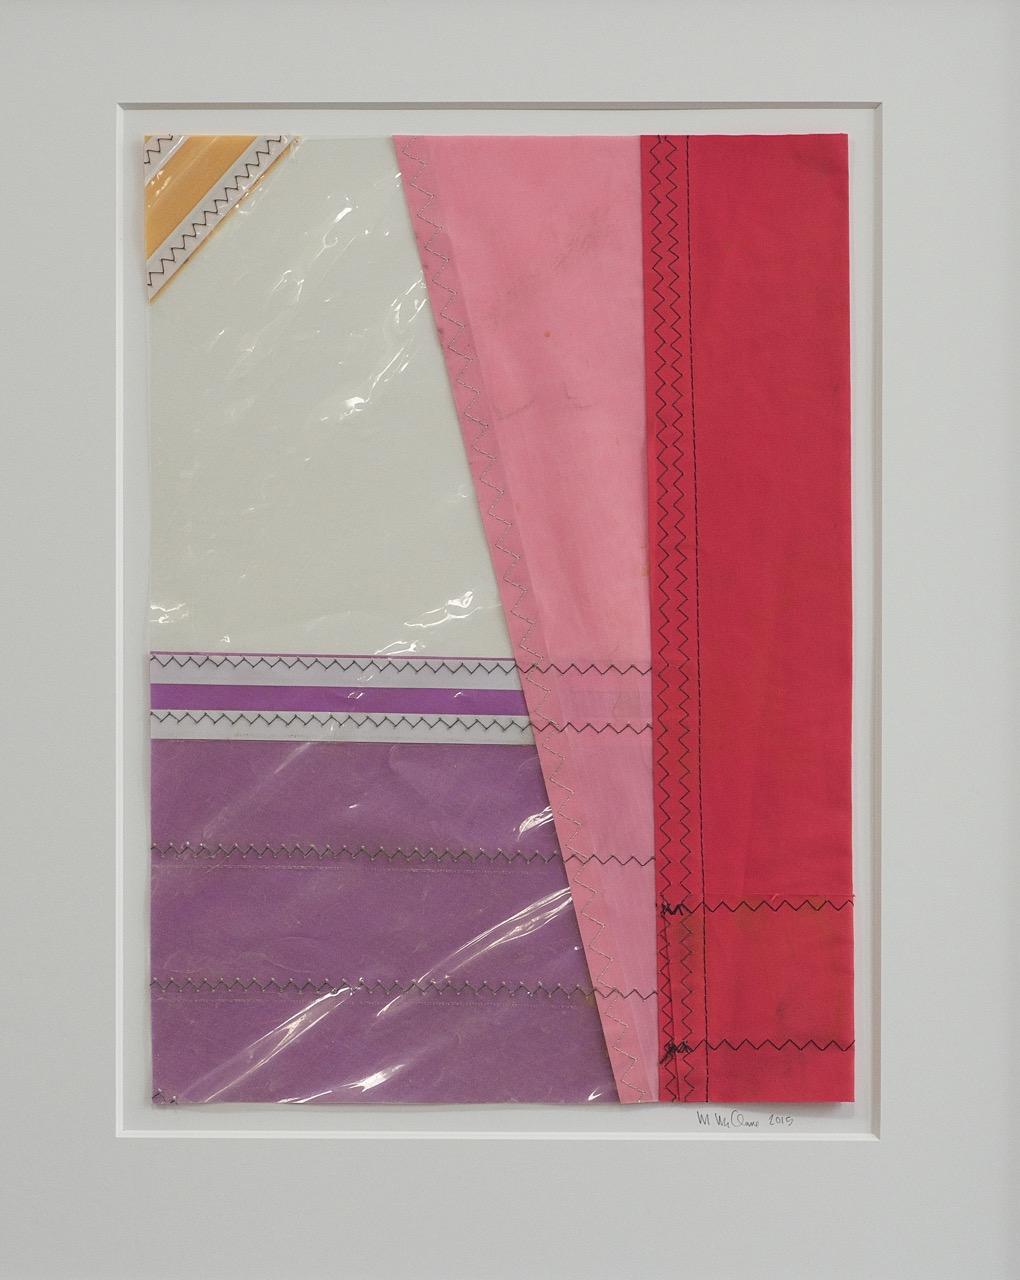 sailcloth composition 2, 2015, 80x60cm.jpg